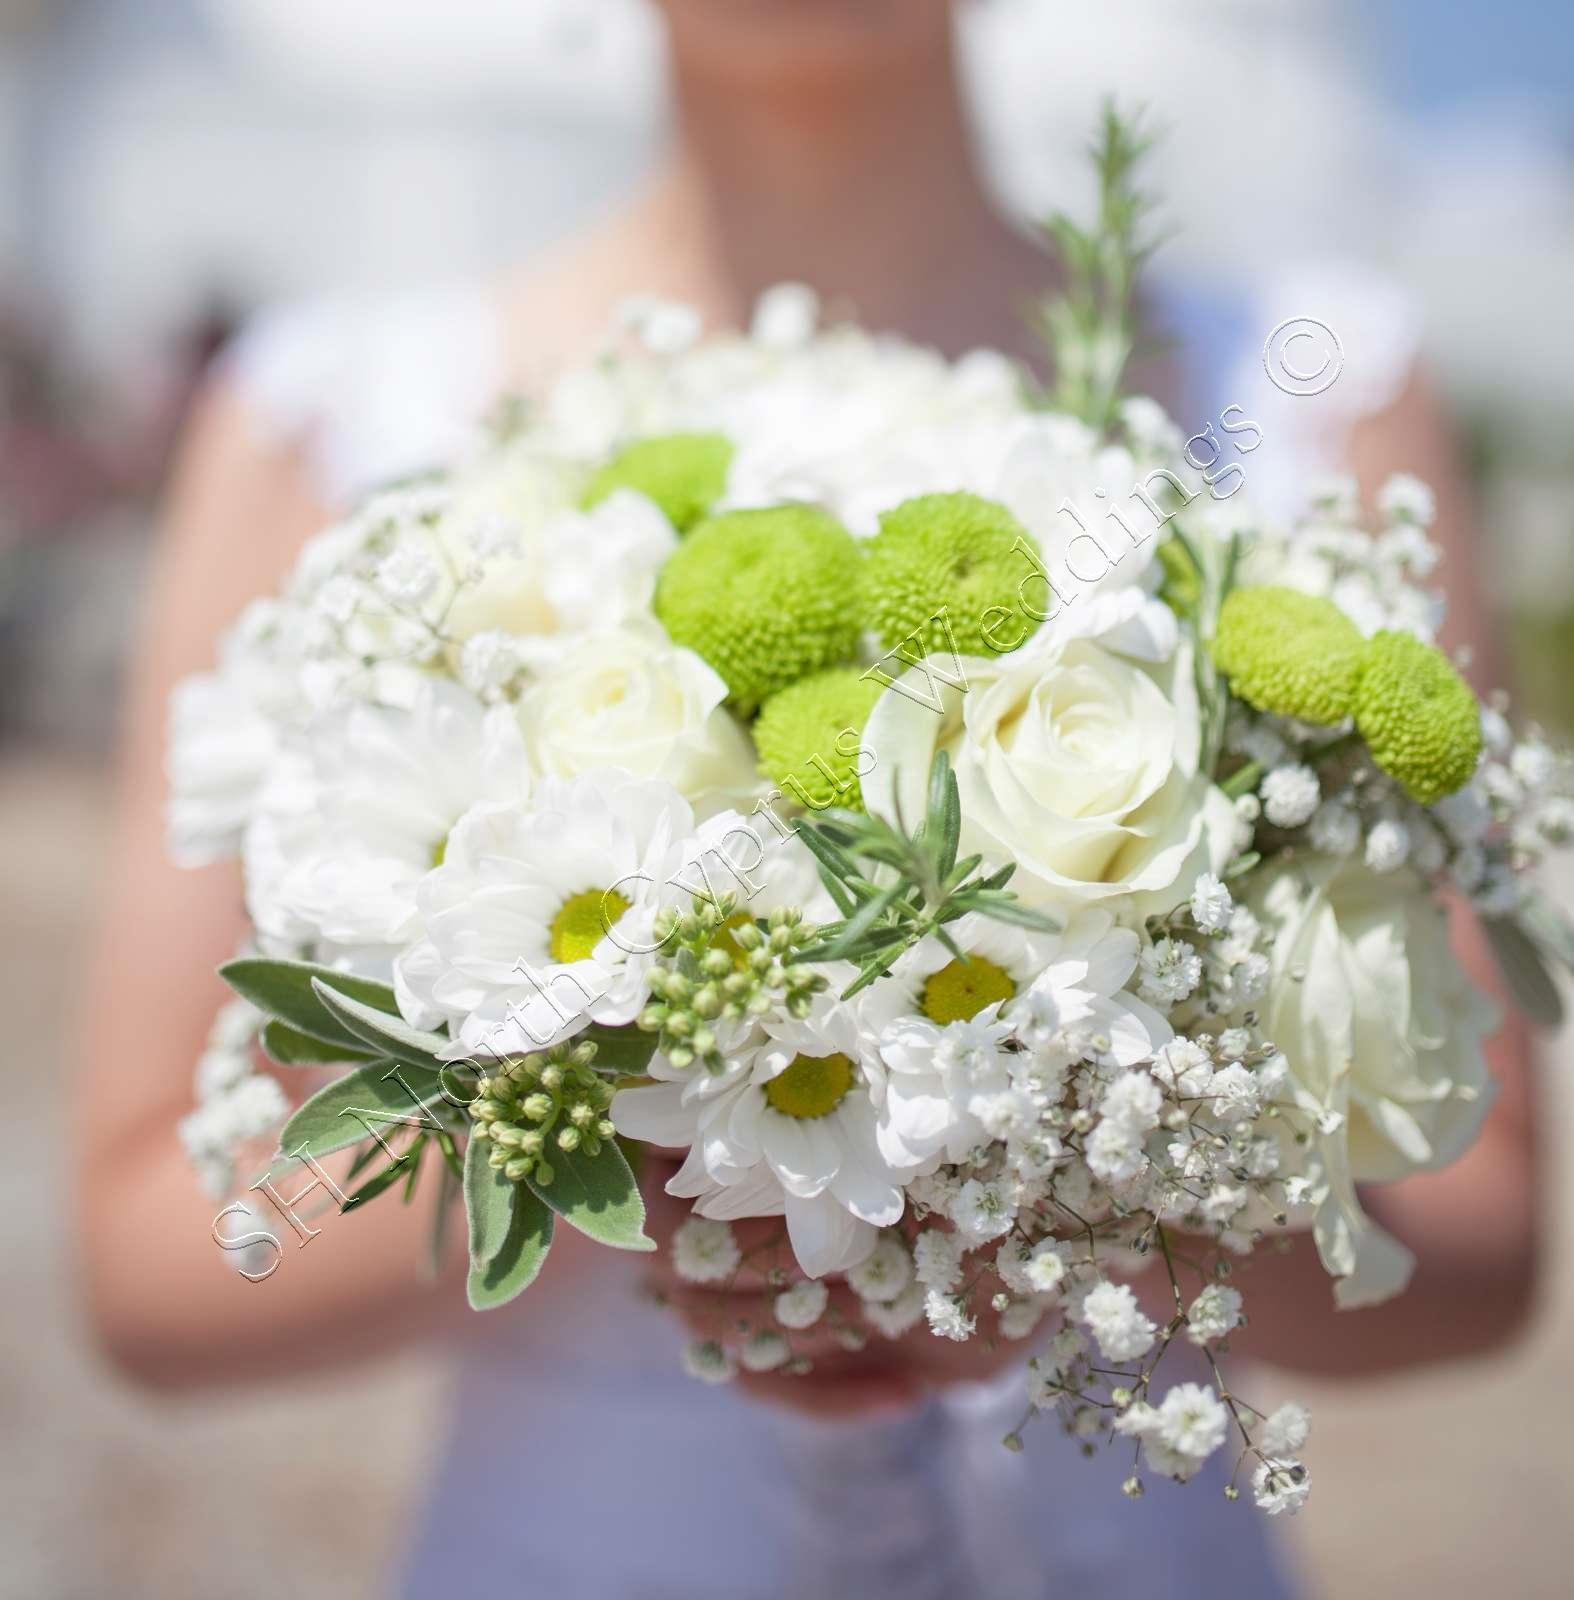 North Cyprus wedding flowers (71)